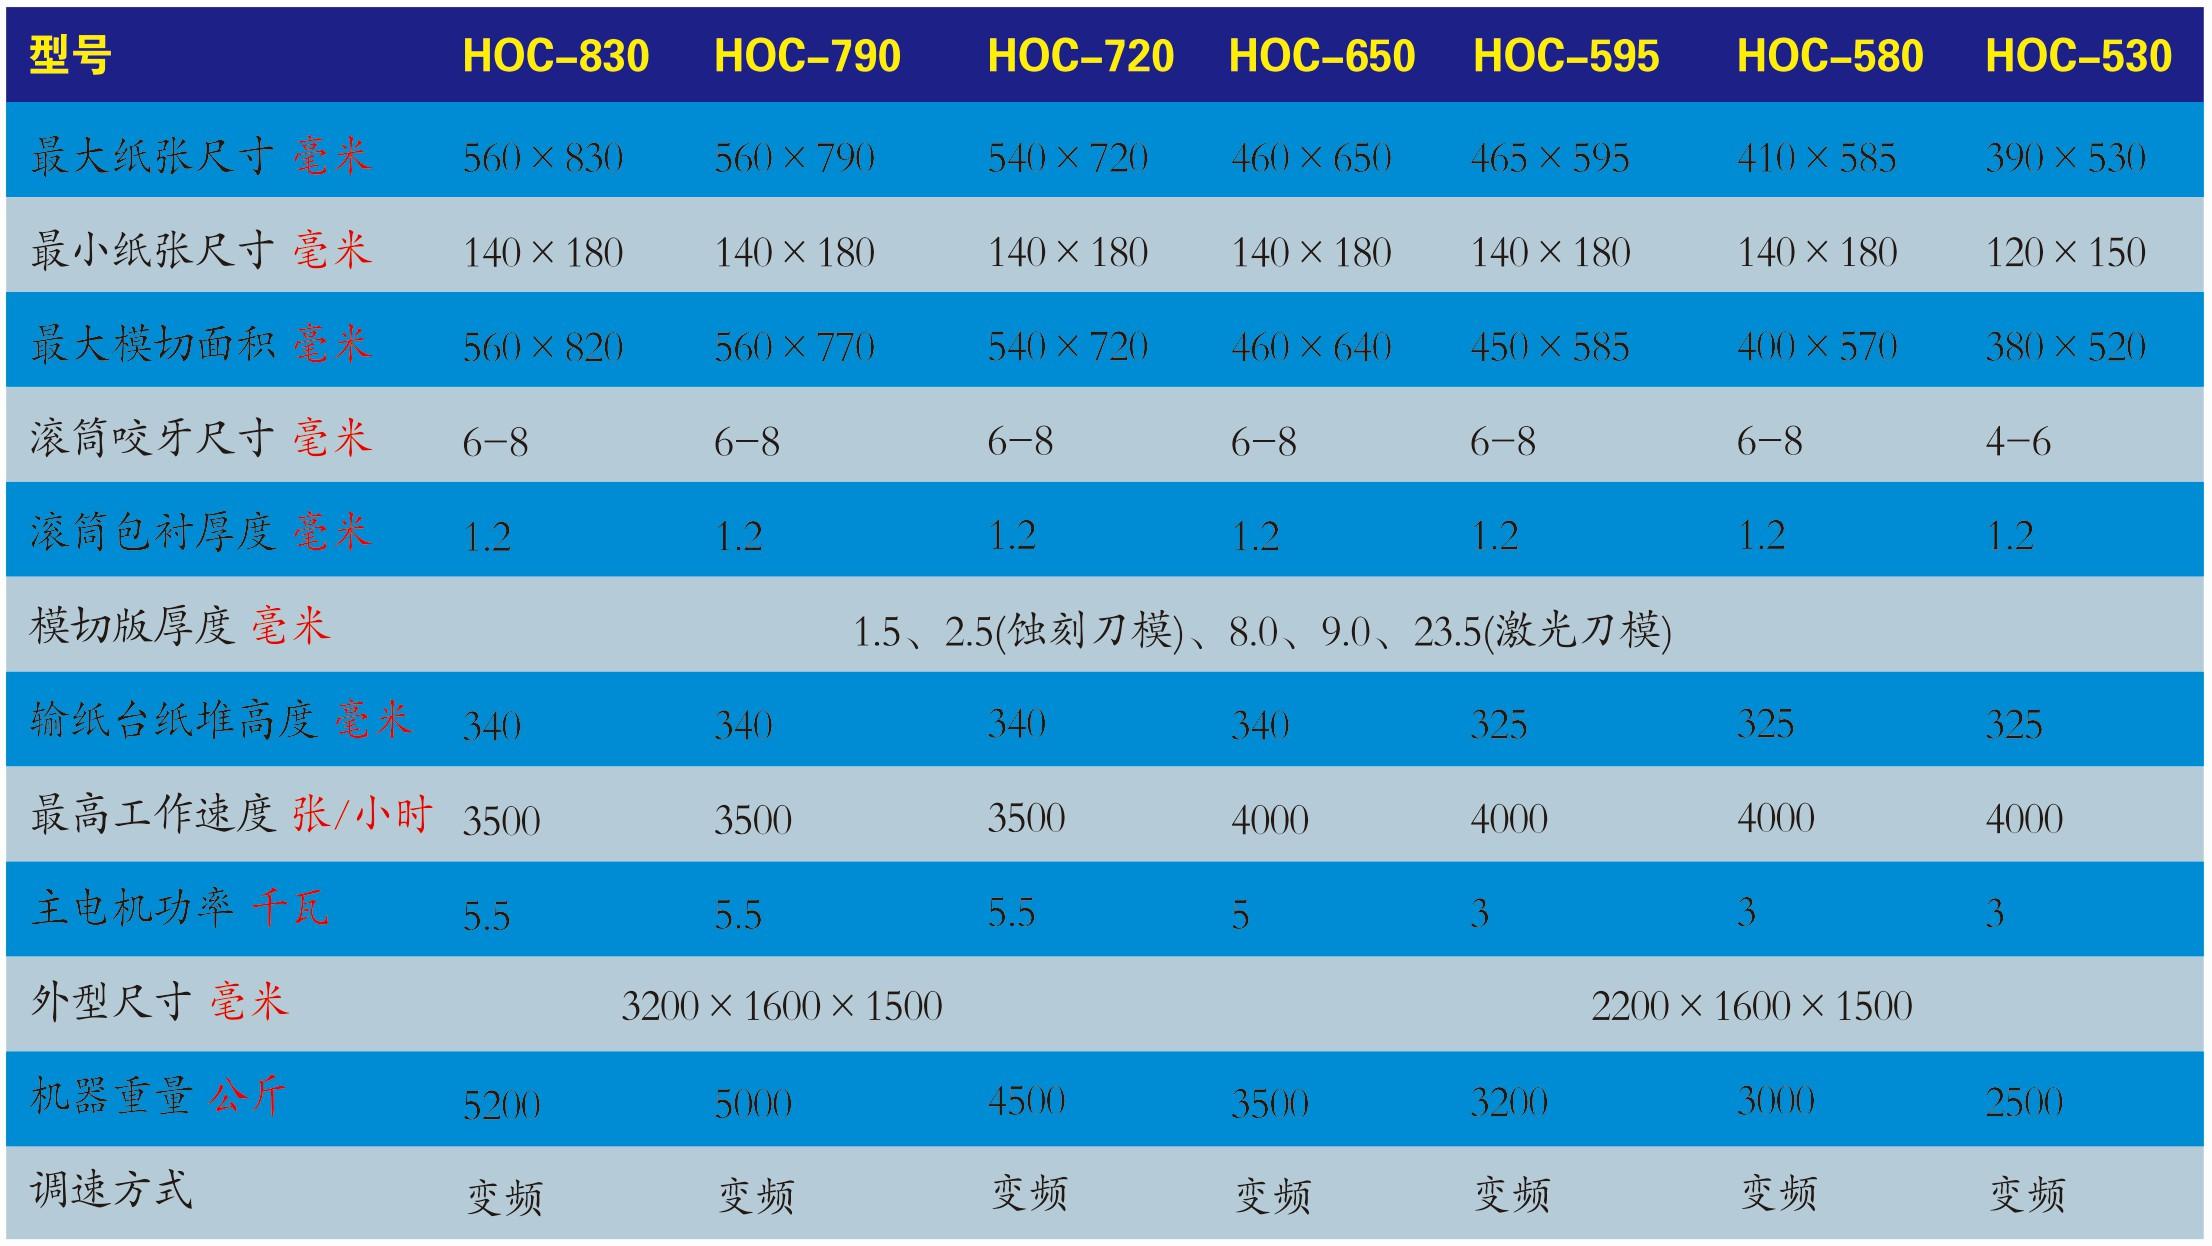 HOC-830-520_WPS图片.jpg